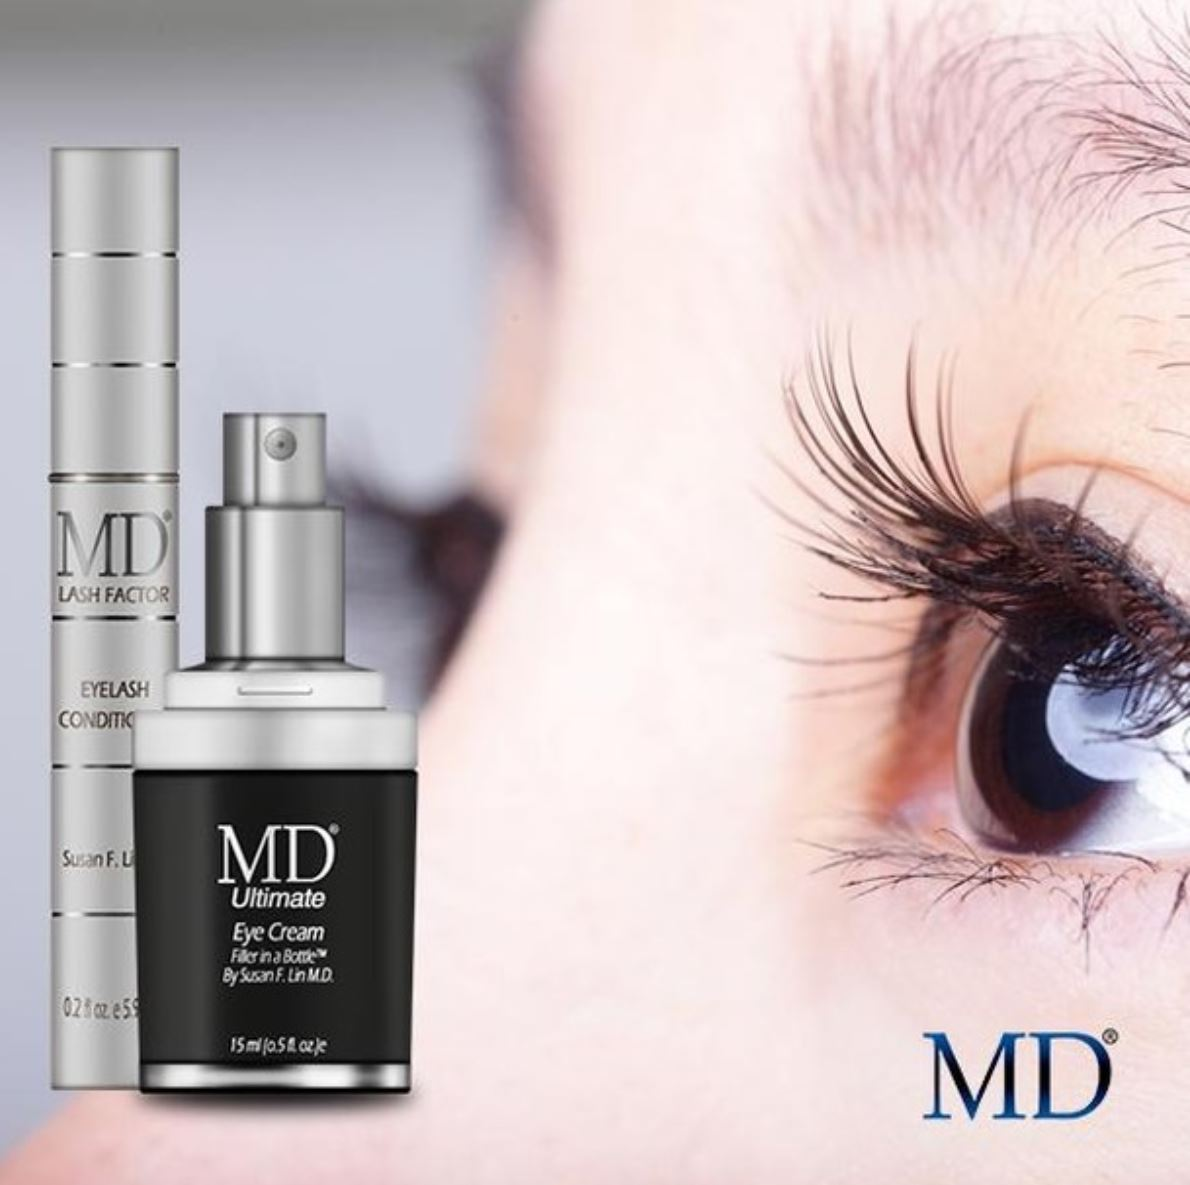 MD Factor Eyelash Conditioner